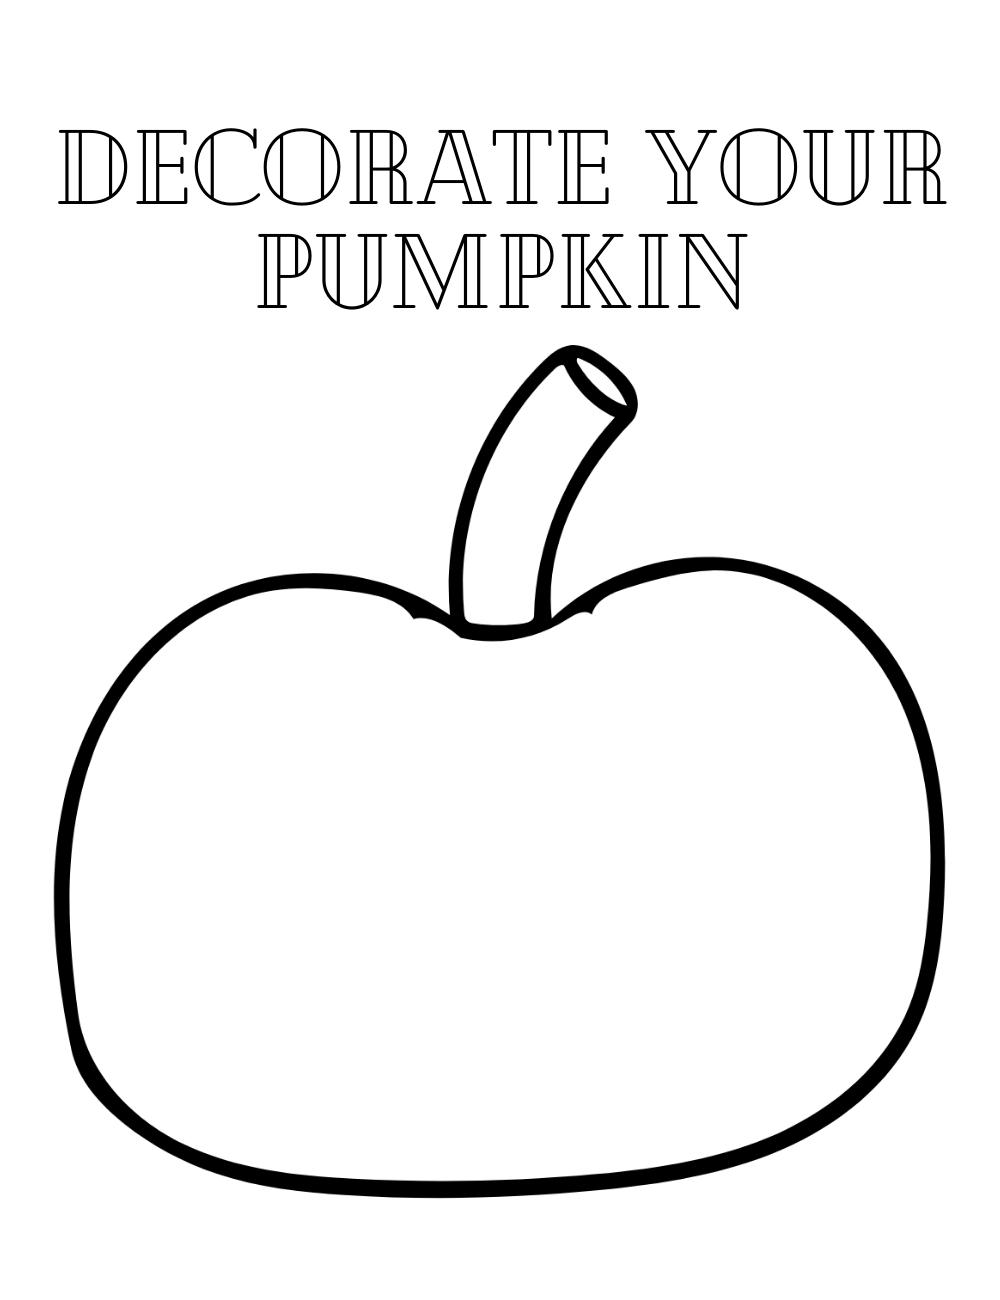 FREE Decorate Your Pumpkin Coloring Sheet - Paper Scissors ...